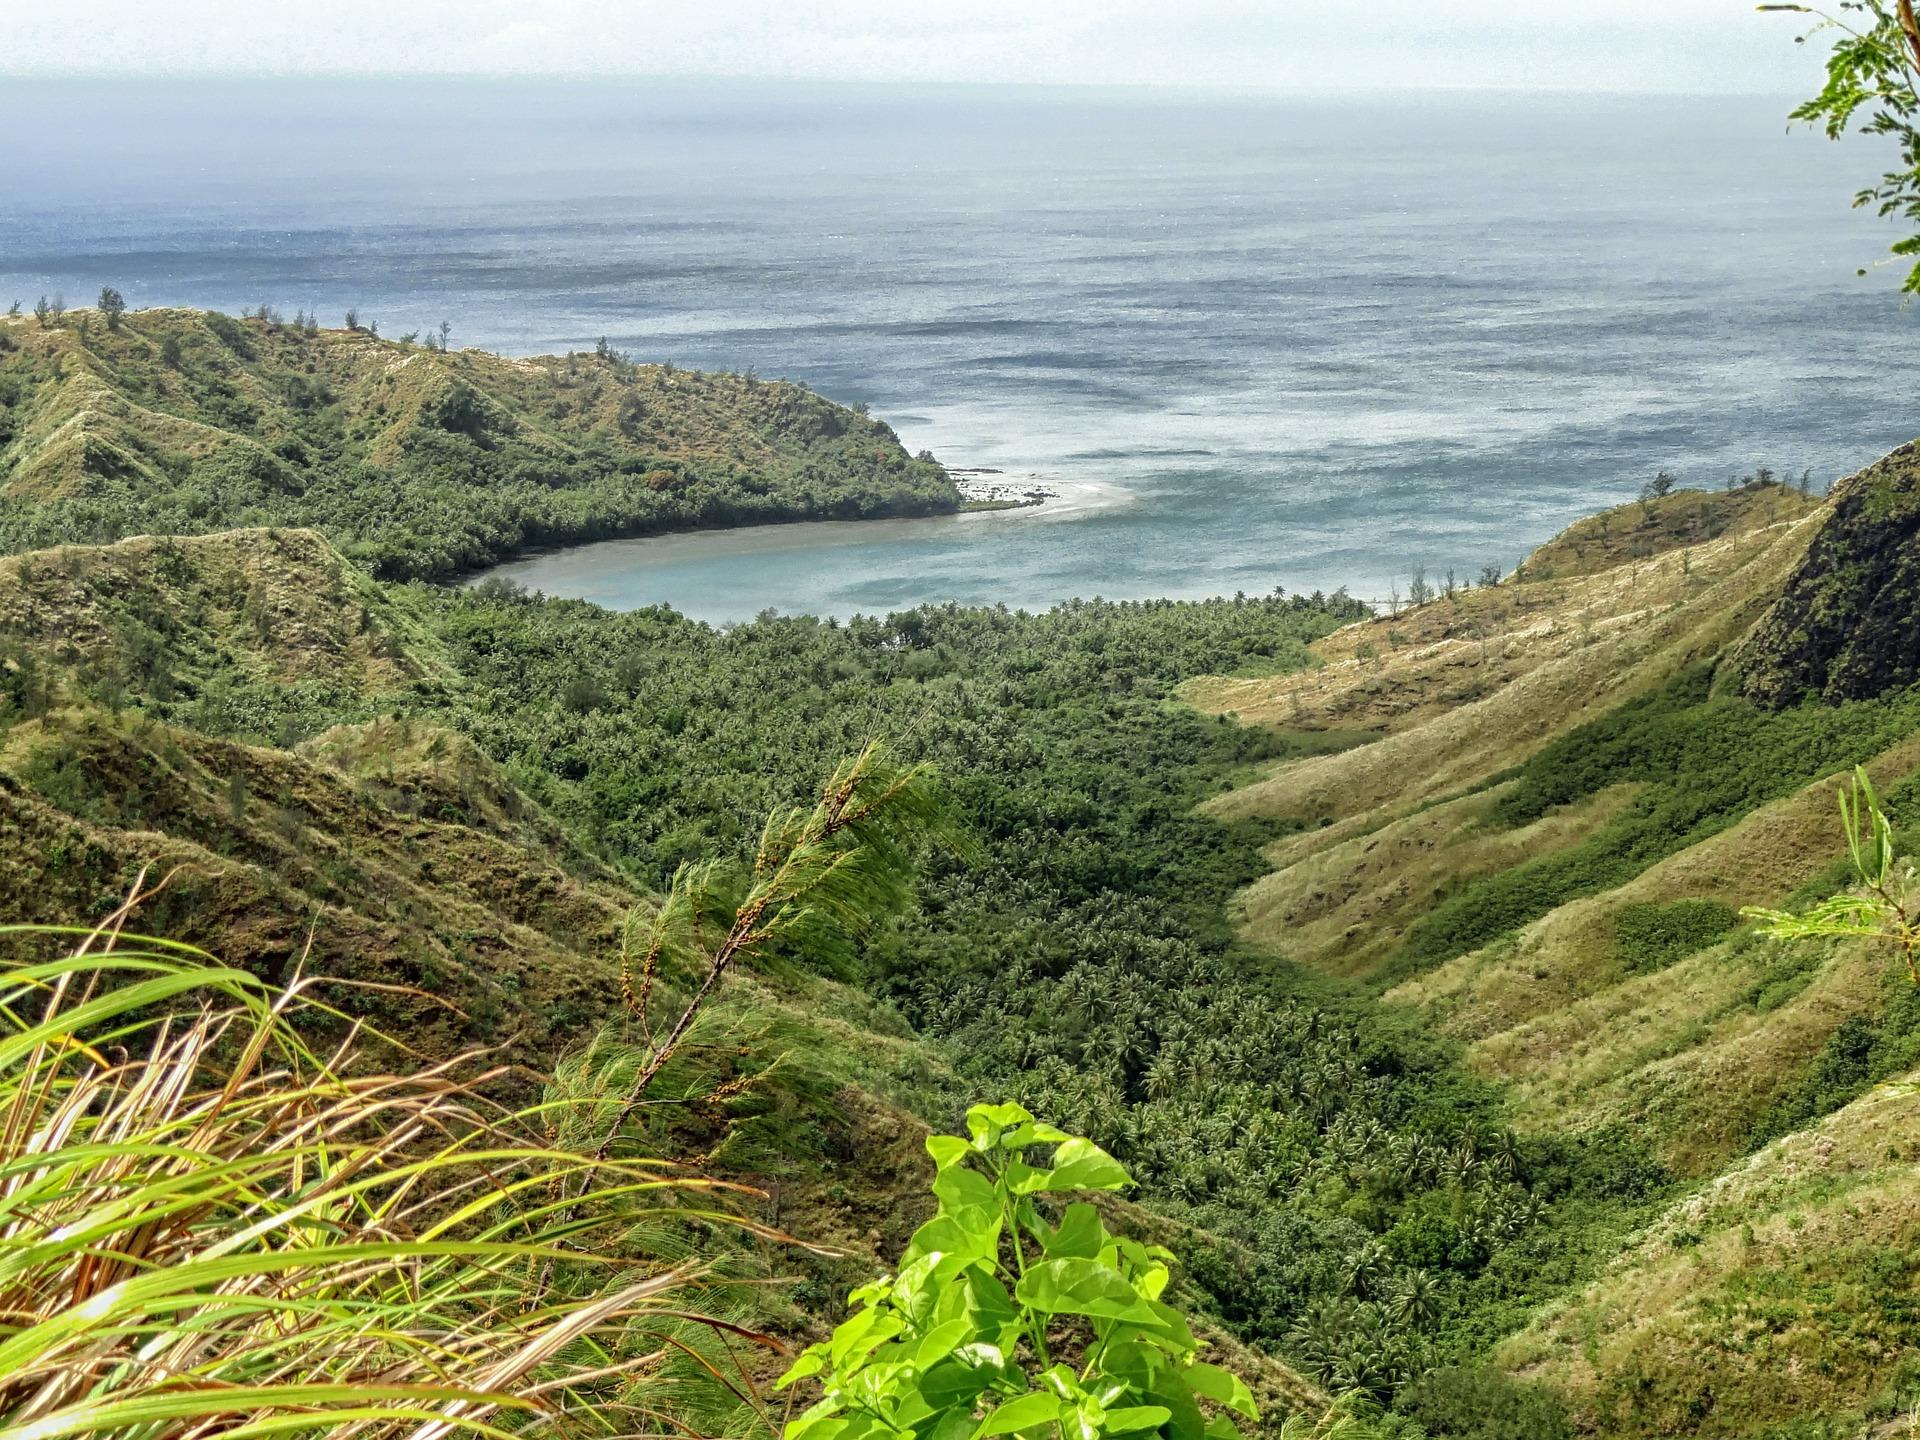 Mountaintop view of Guam